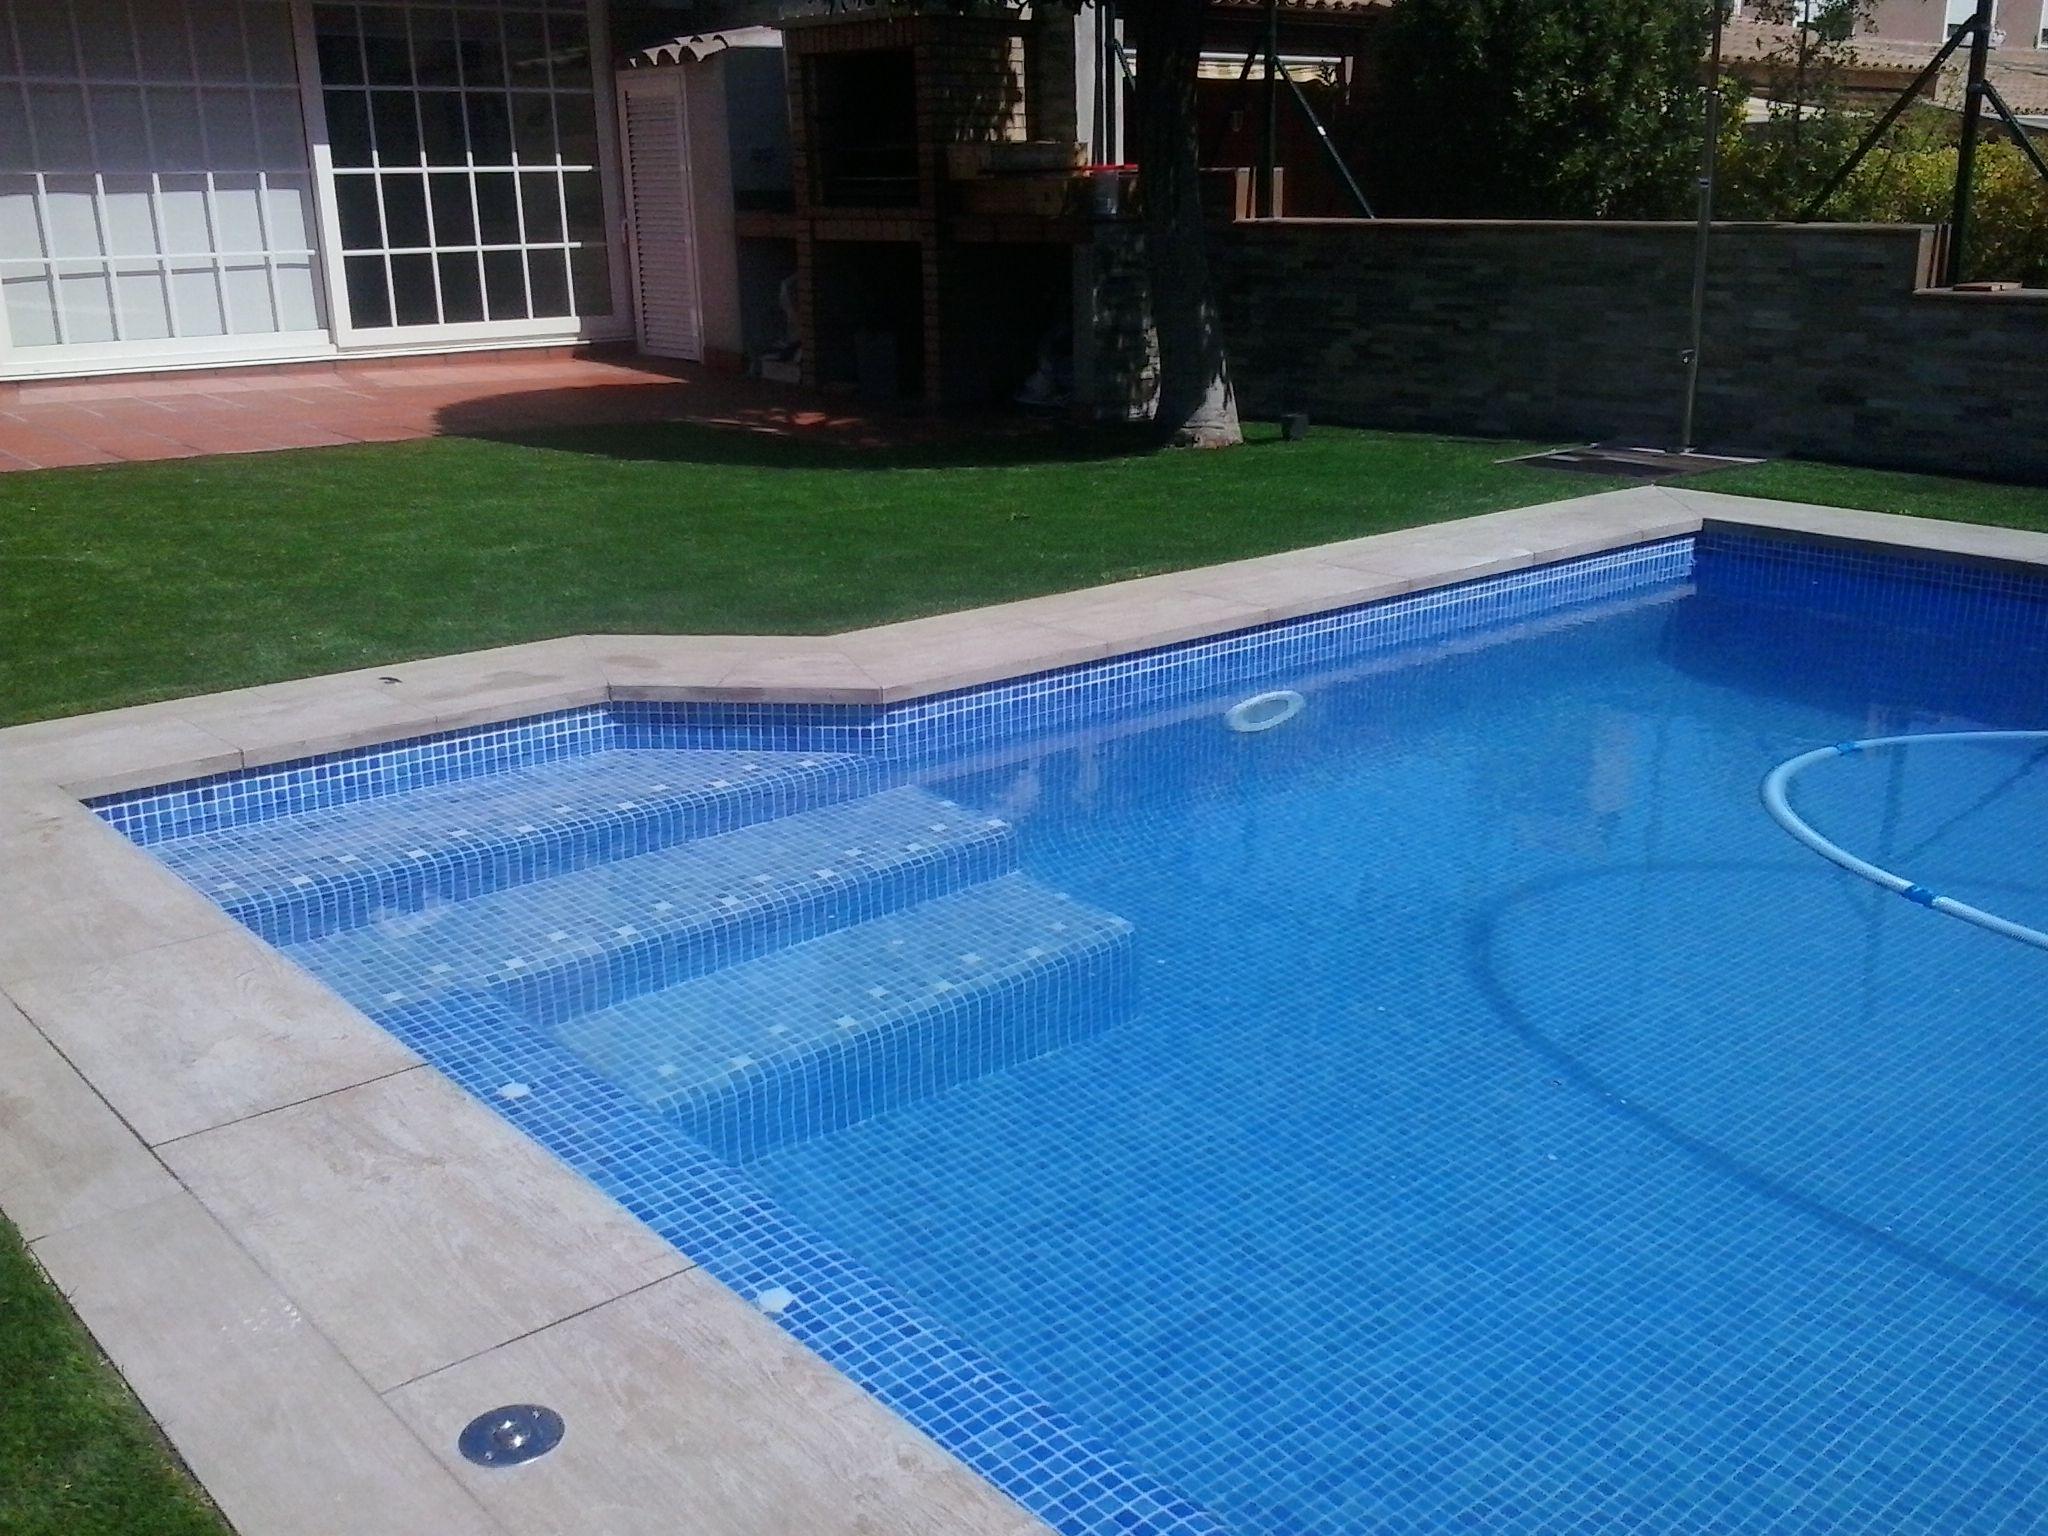 Piscinas de material elegant piscina de vidro with - Material de piscina ...